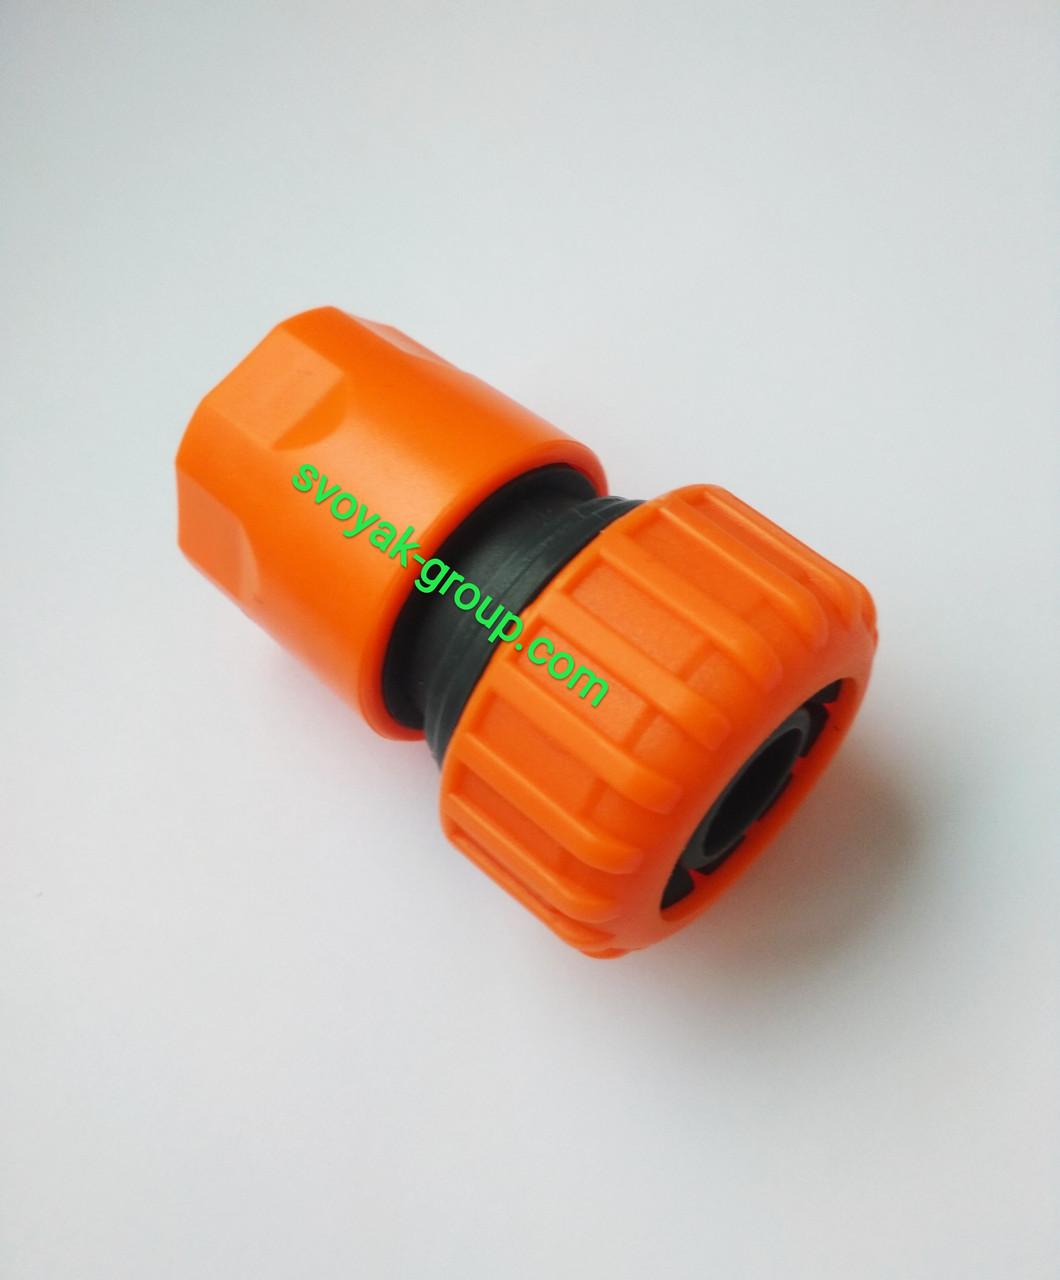 "Коннектор для шлангов 1/2"" - 5/8"" дюйма ""Presto Ps"" Primo - 5809 (orange, green)."